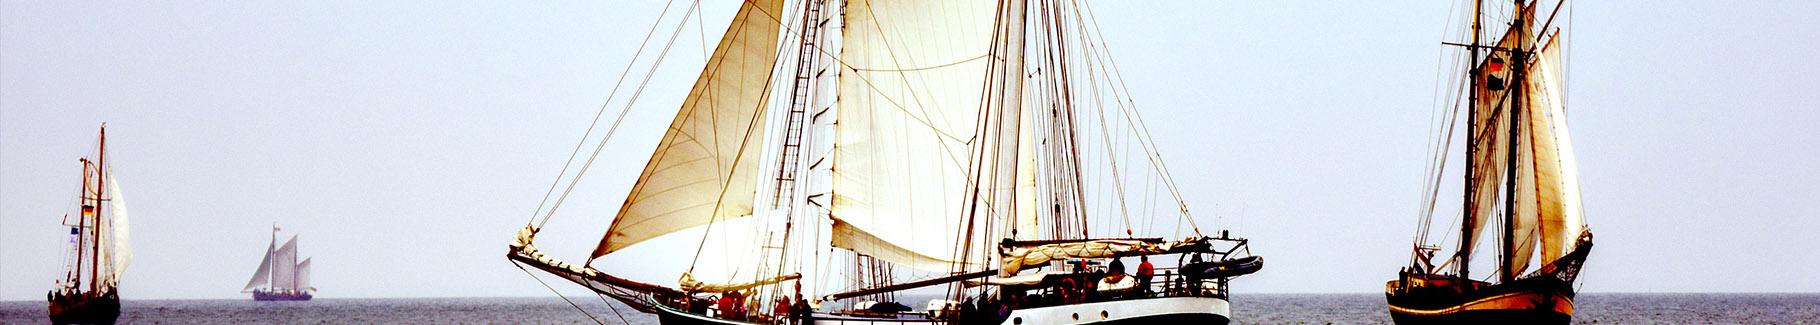 Fototapeta żeglujące statki